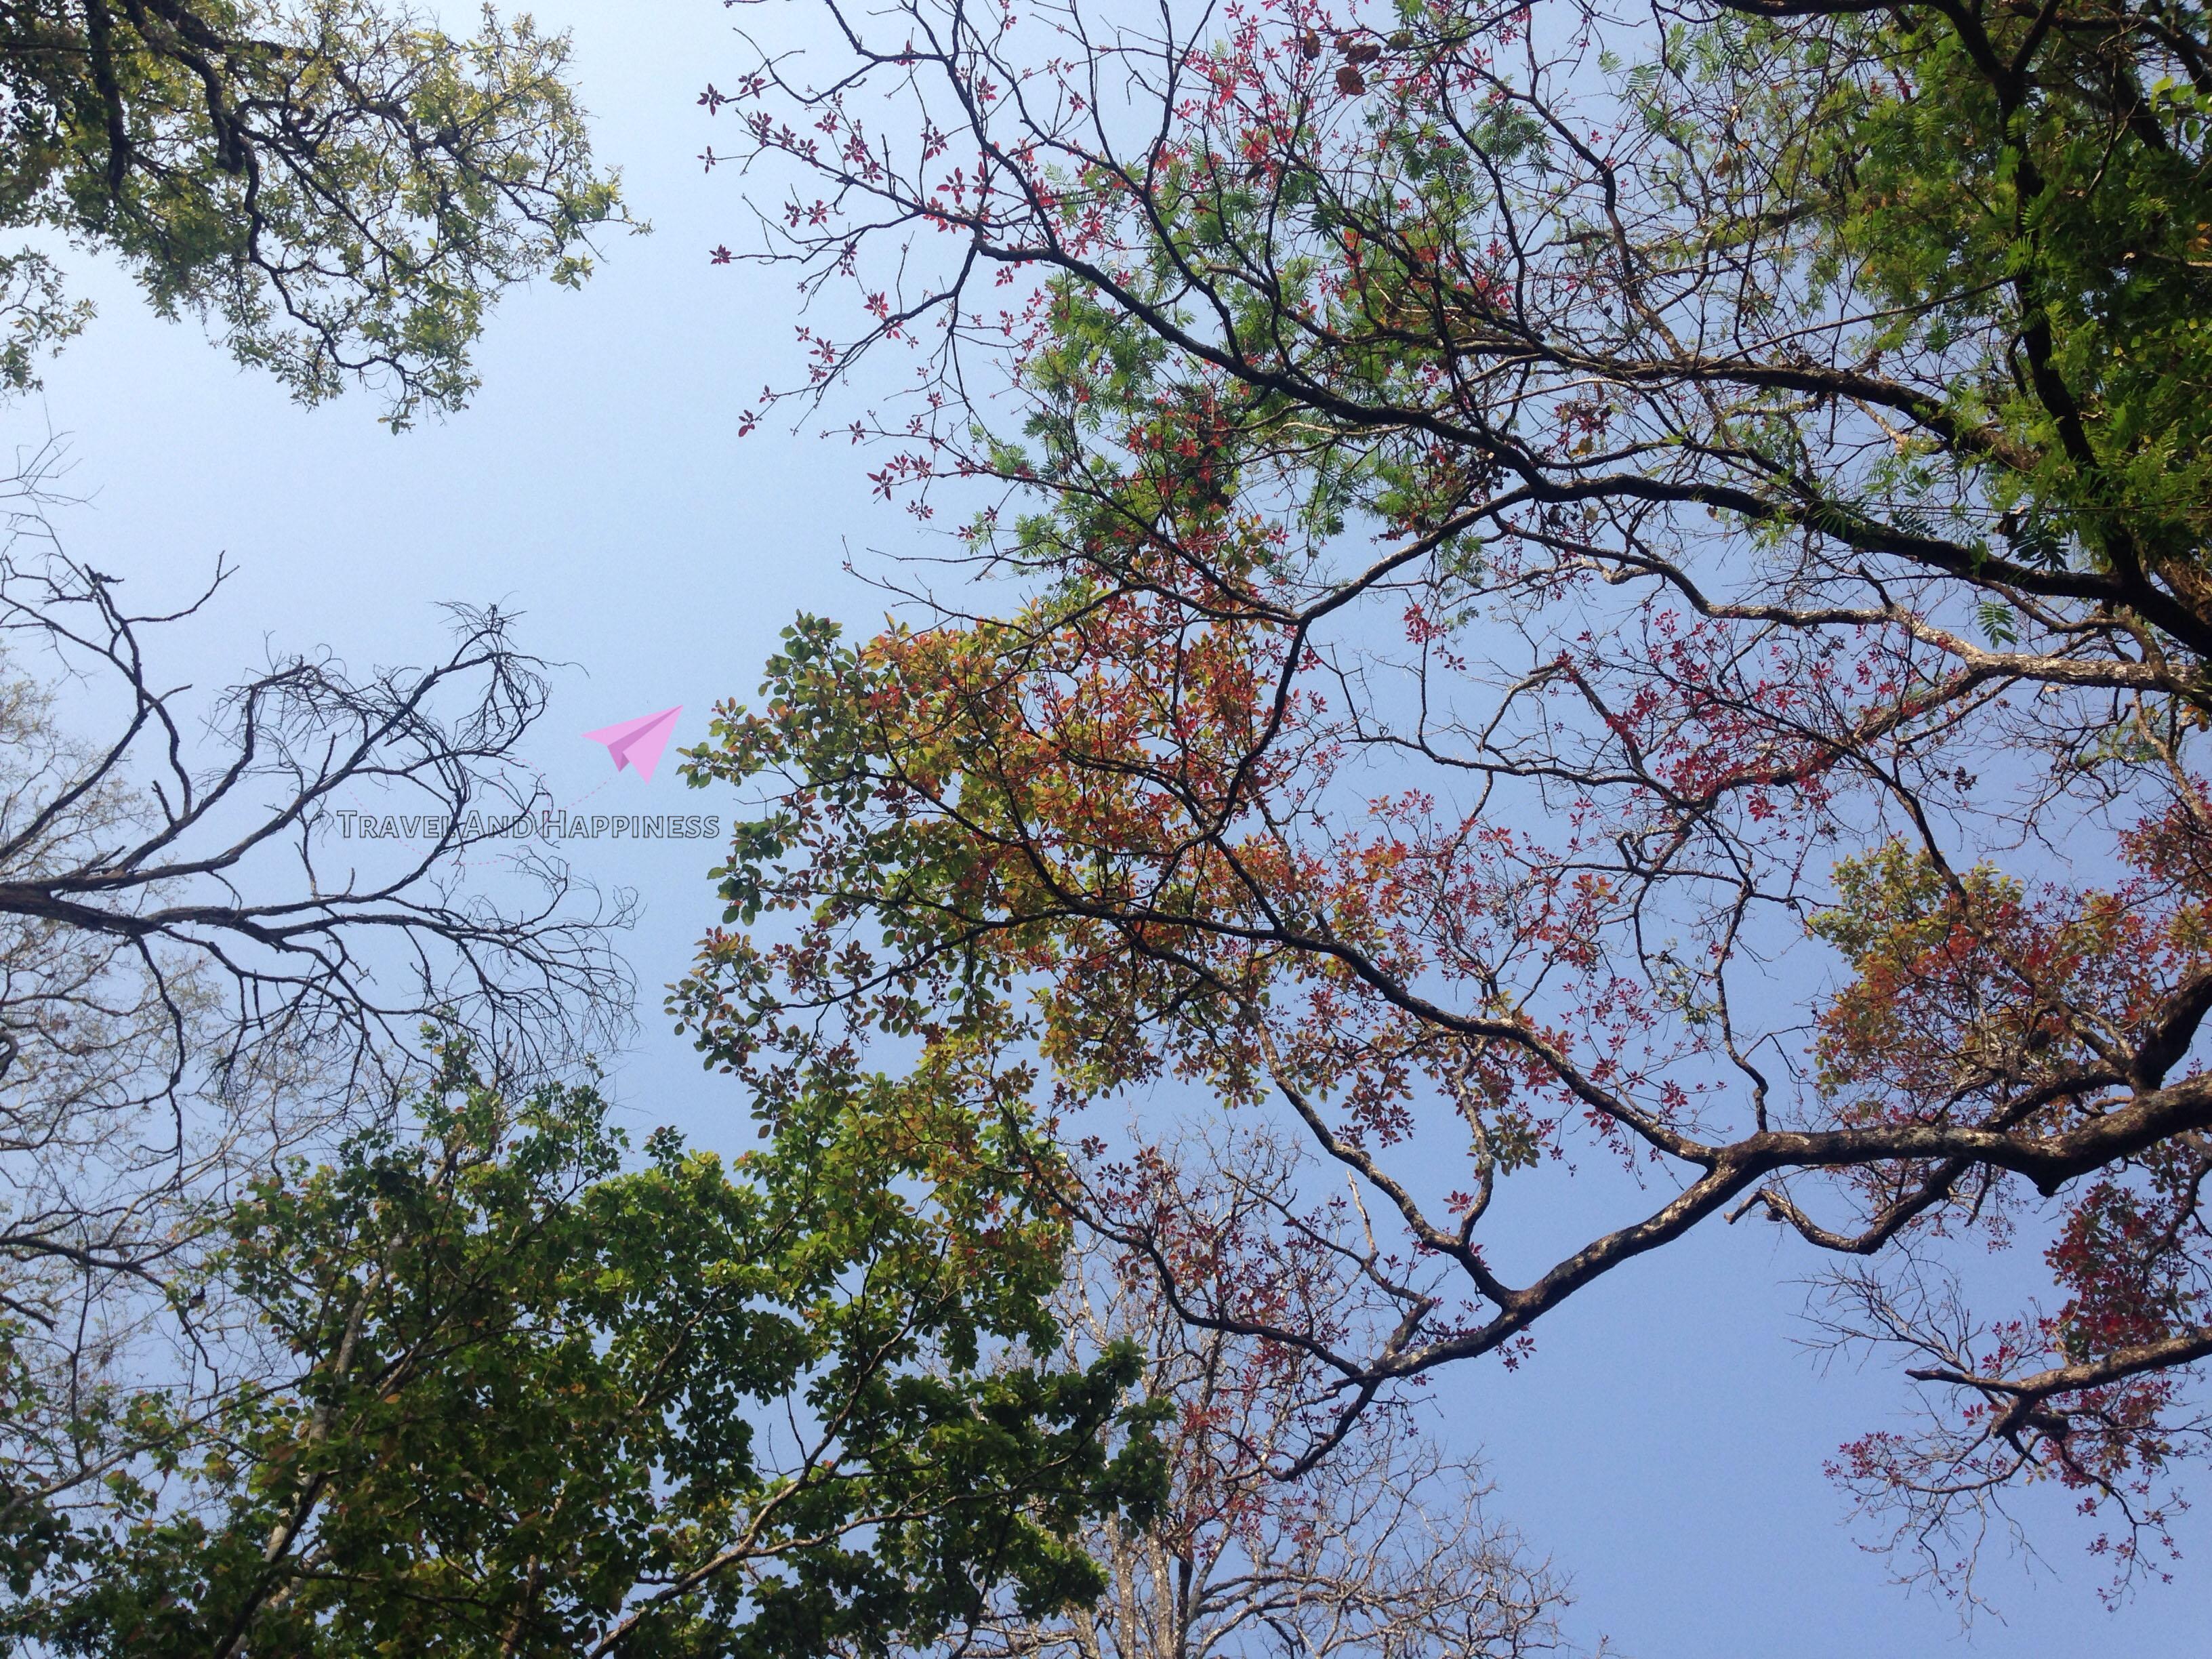 17. Forest sky inside Bhadra Tiger Reserve